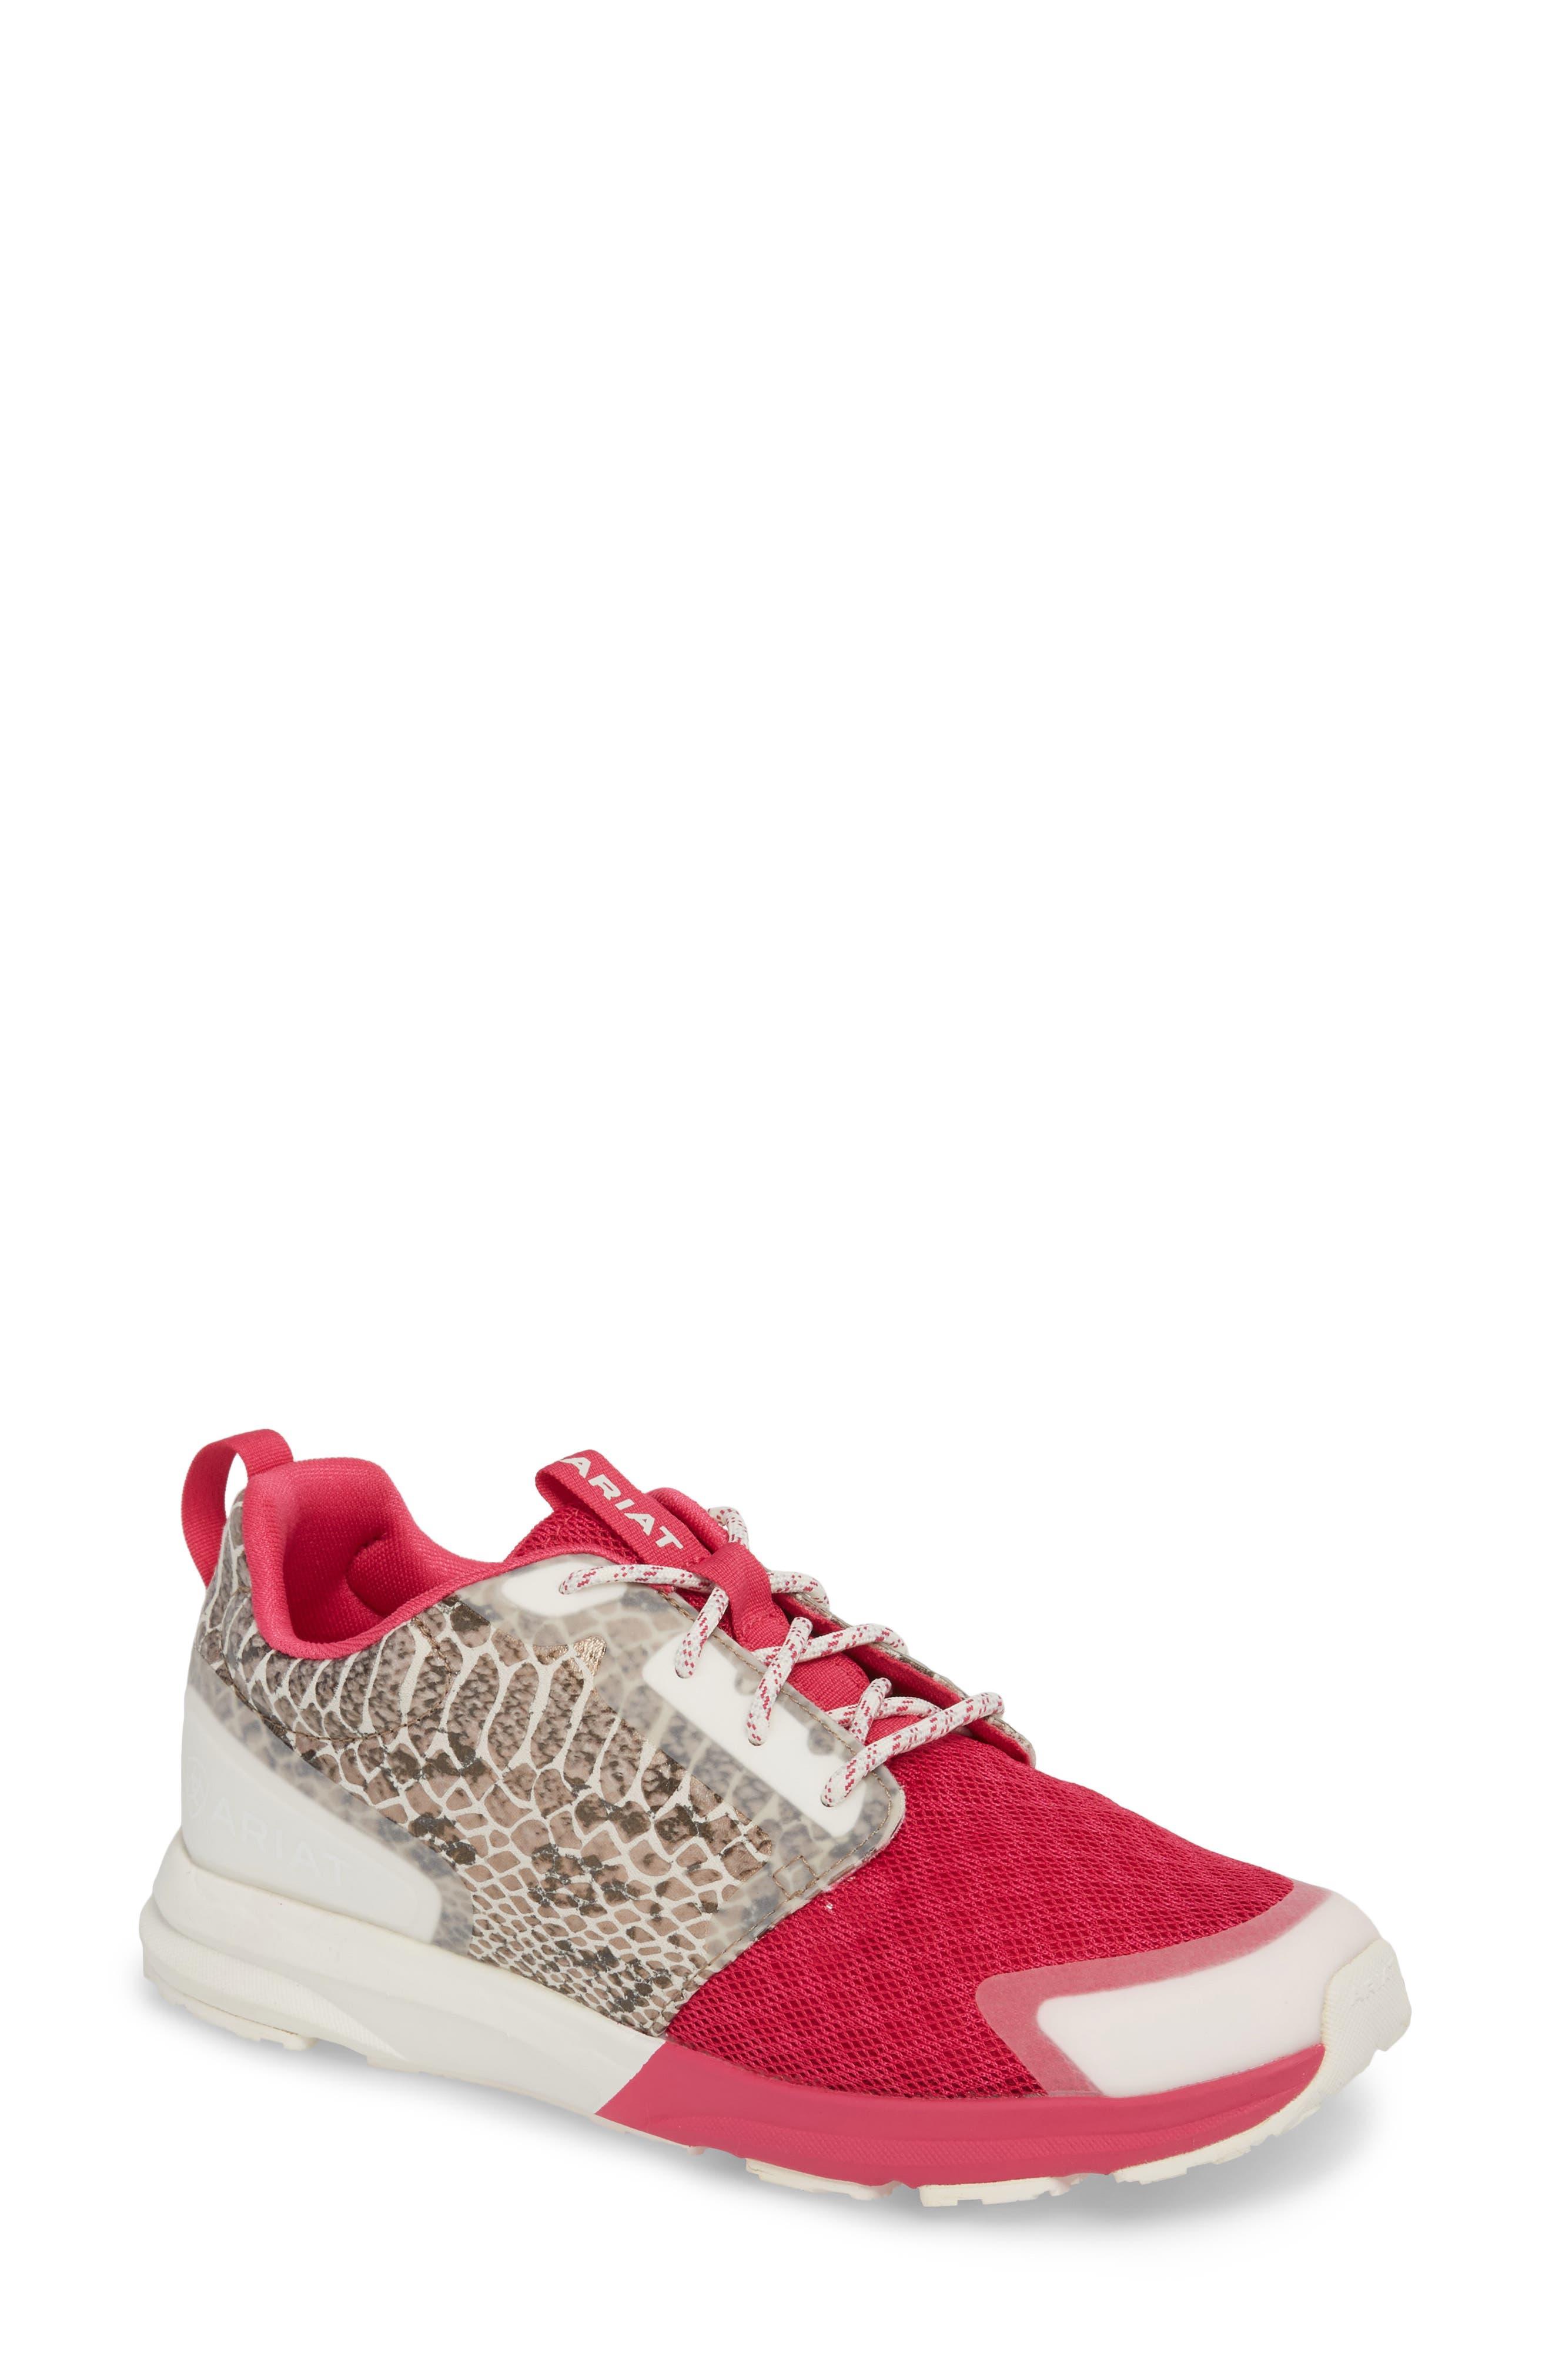 Ariat Fuse Print Sneaker- Pink